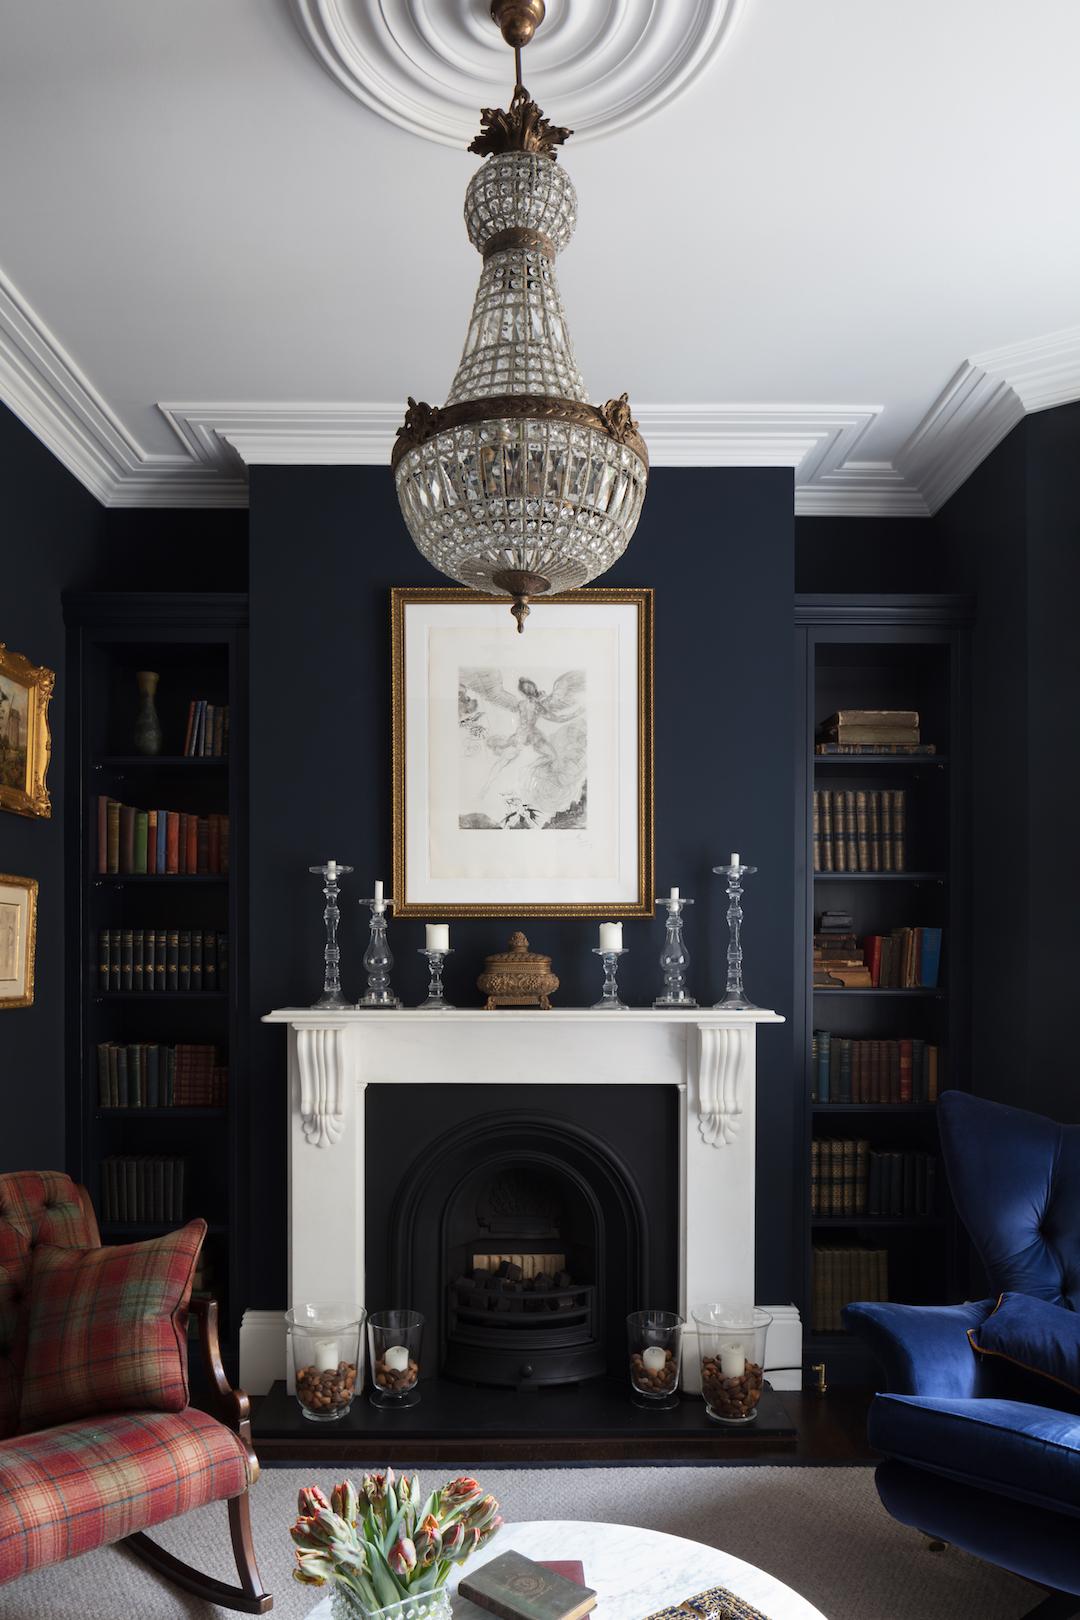 emma-collins-interiors-blackheath-project-humphrey-munson-2